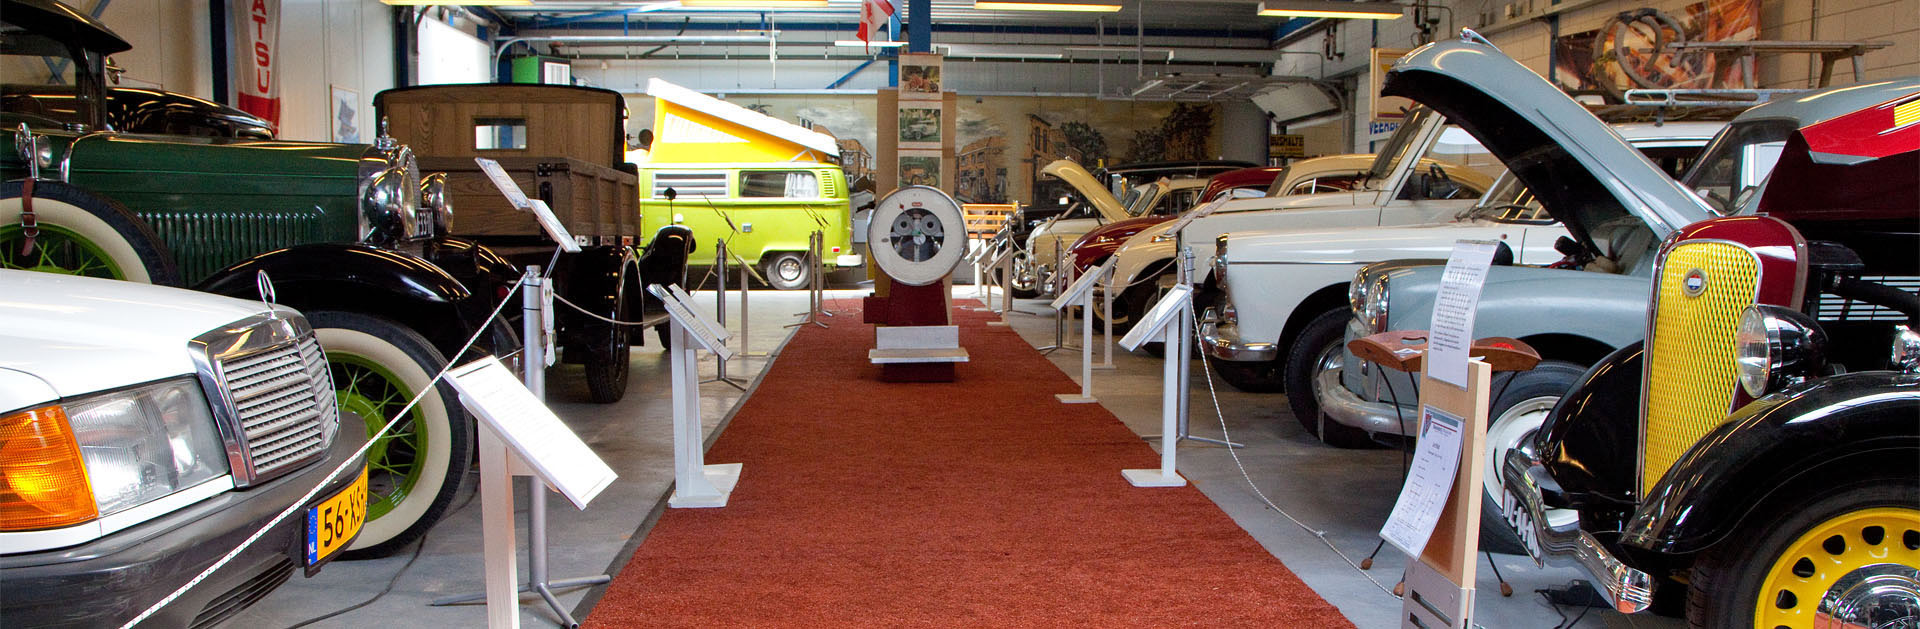 Achterhoeks Oldtimer Museum - Dinxperlo Regio Achterhoek - Liemers